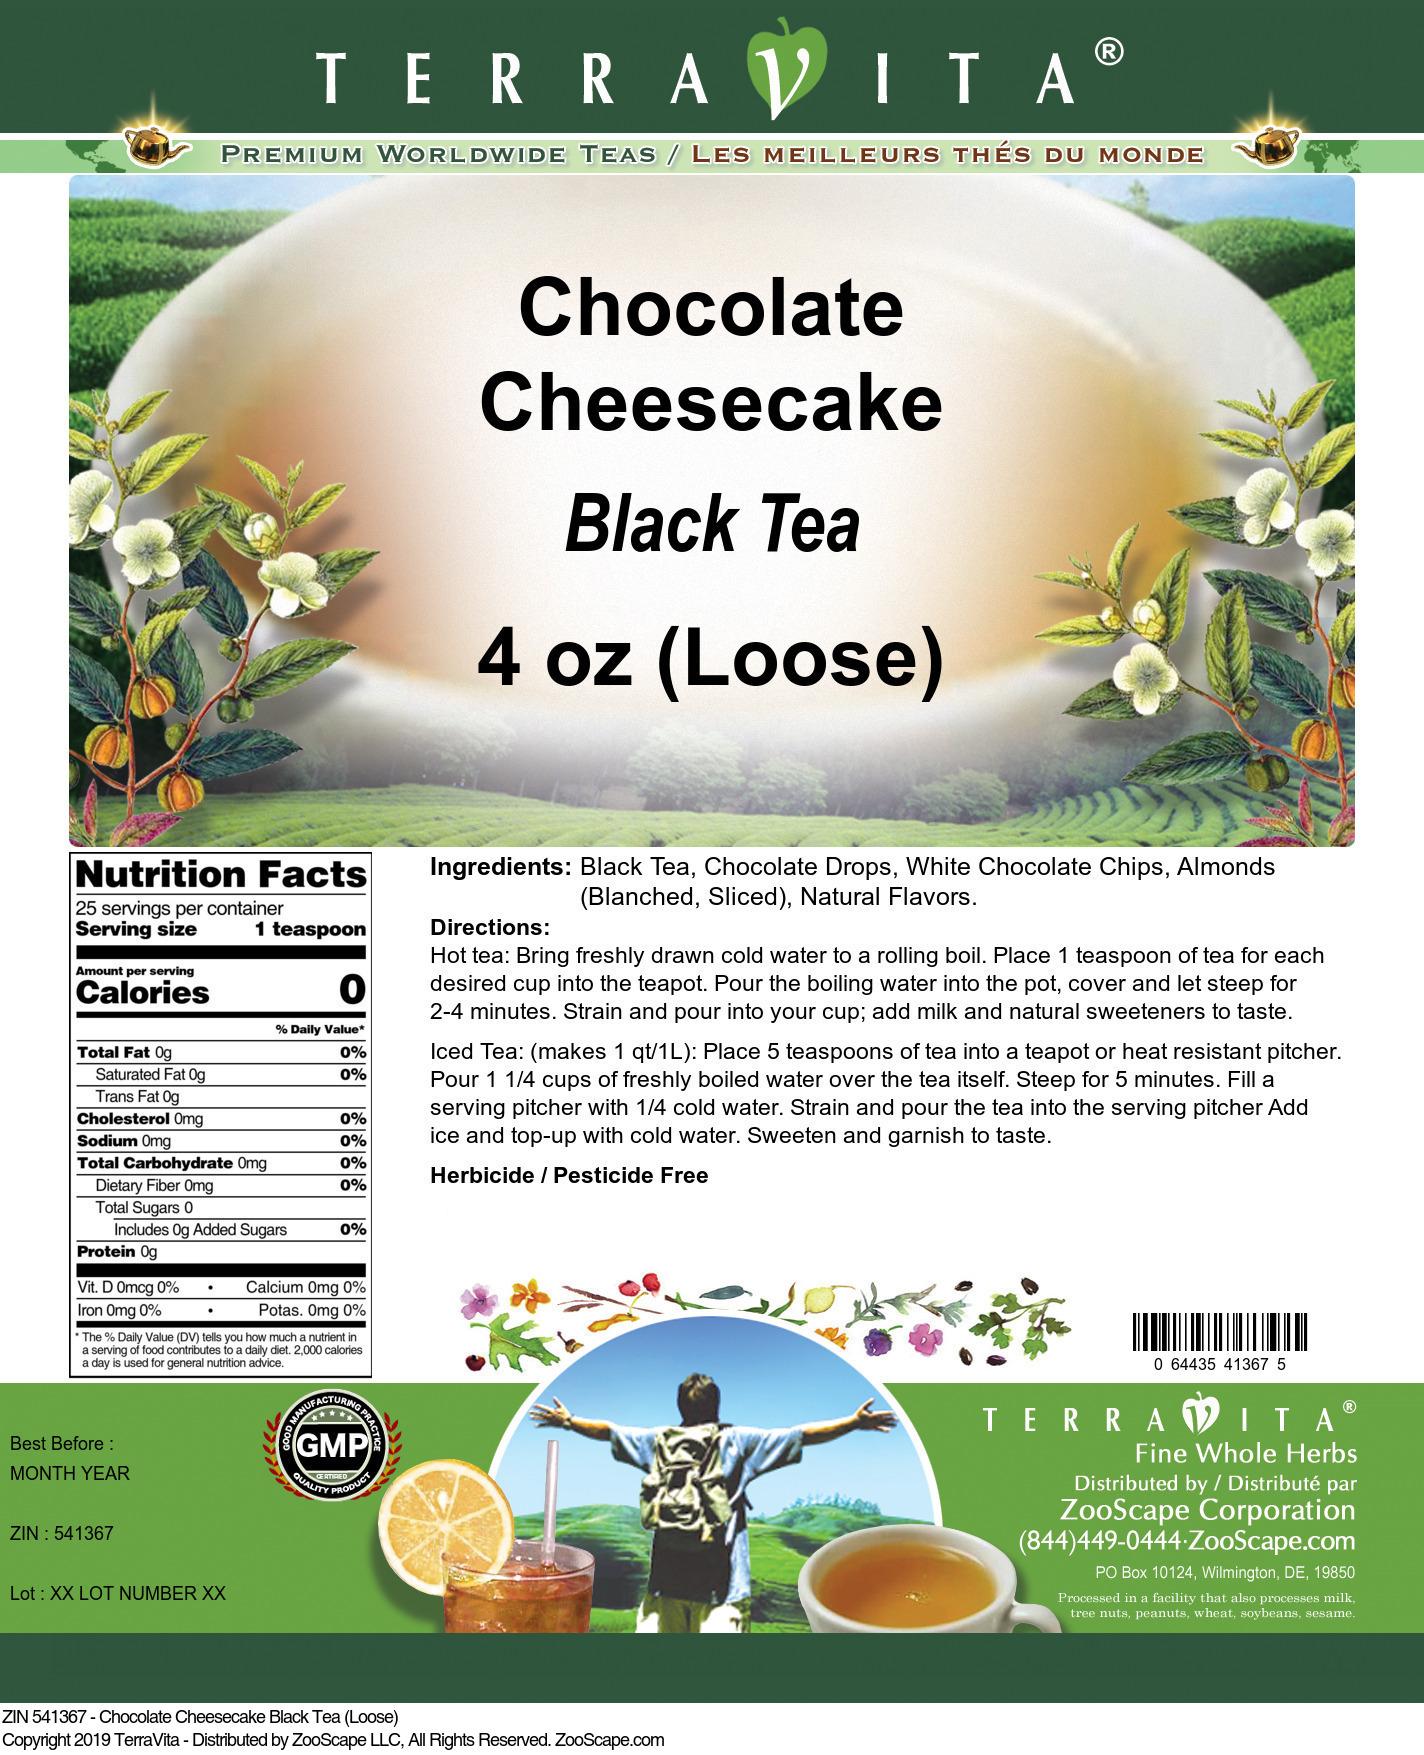 Chocolate Cheesecake Black Tea (Loose)